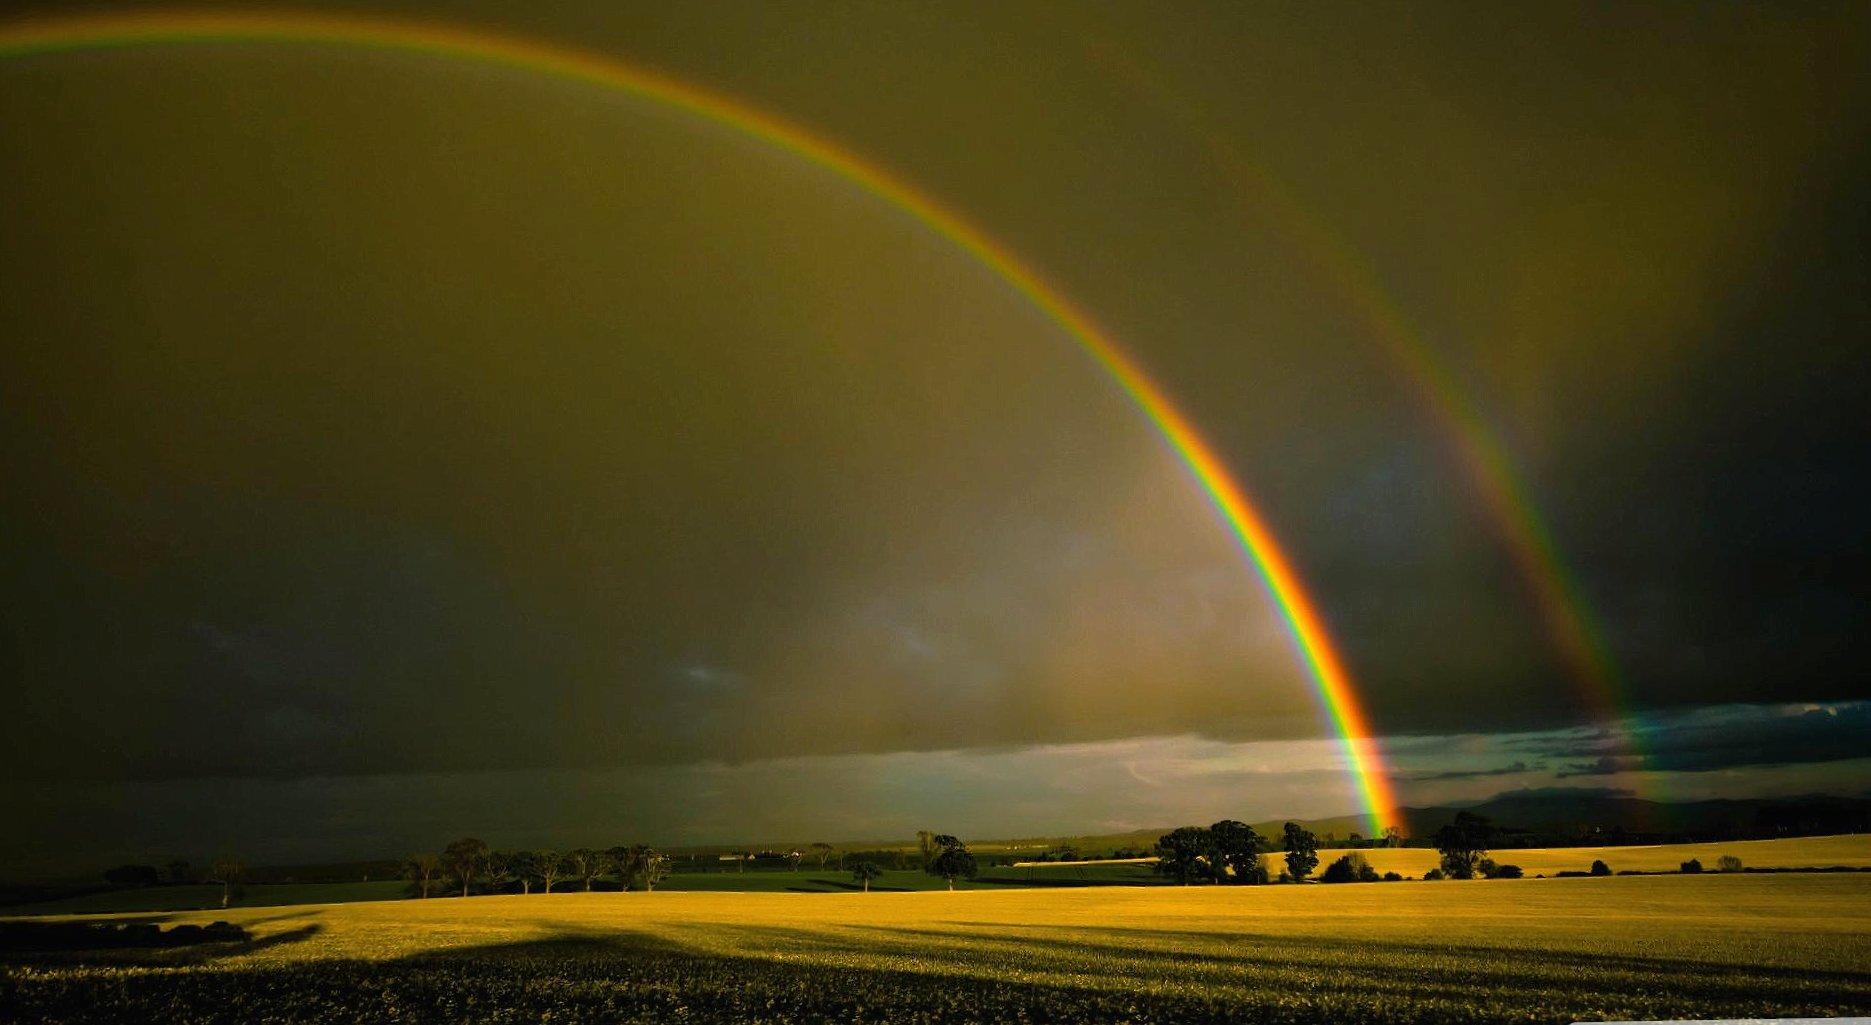 Twin rainbow wallpapers HD quality